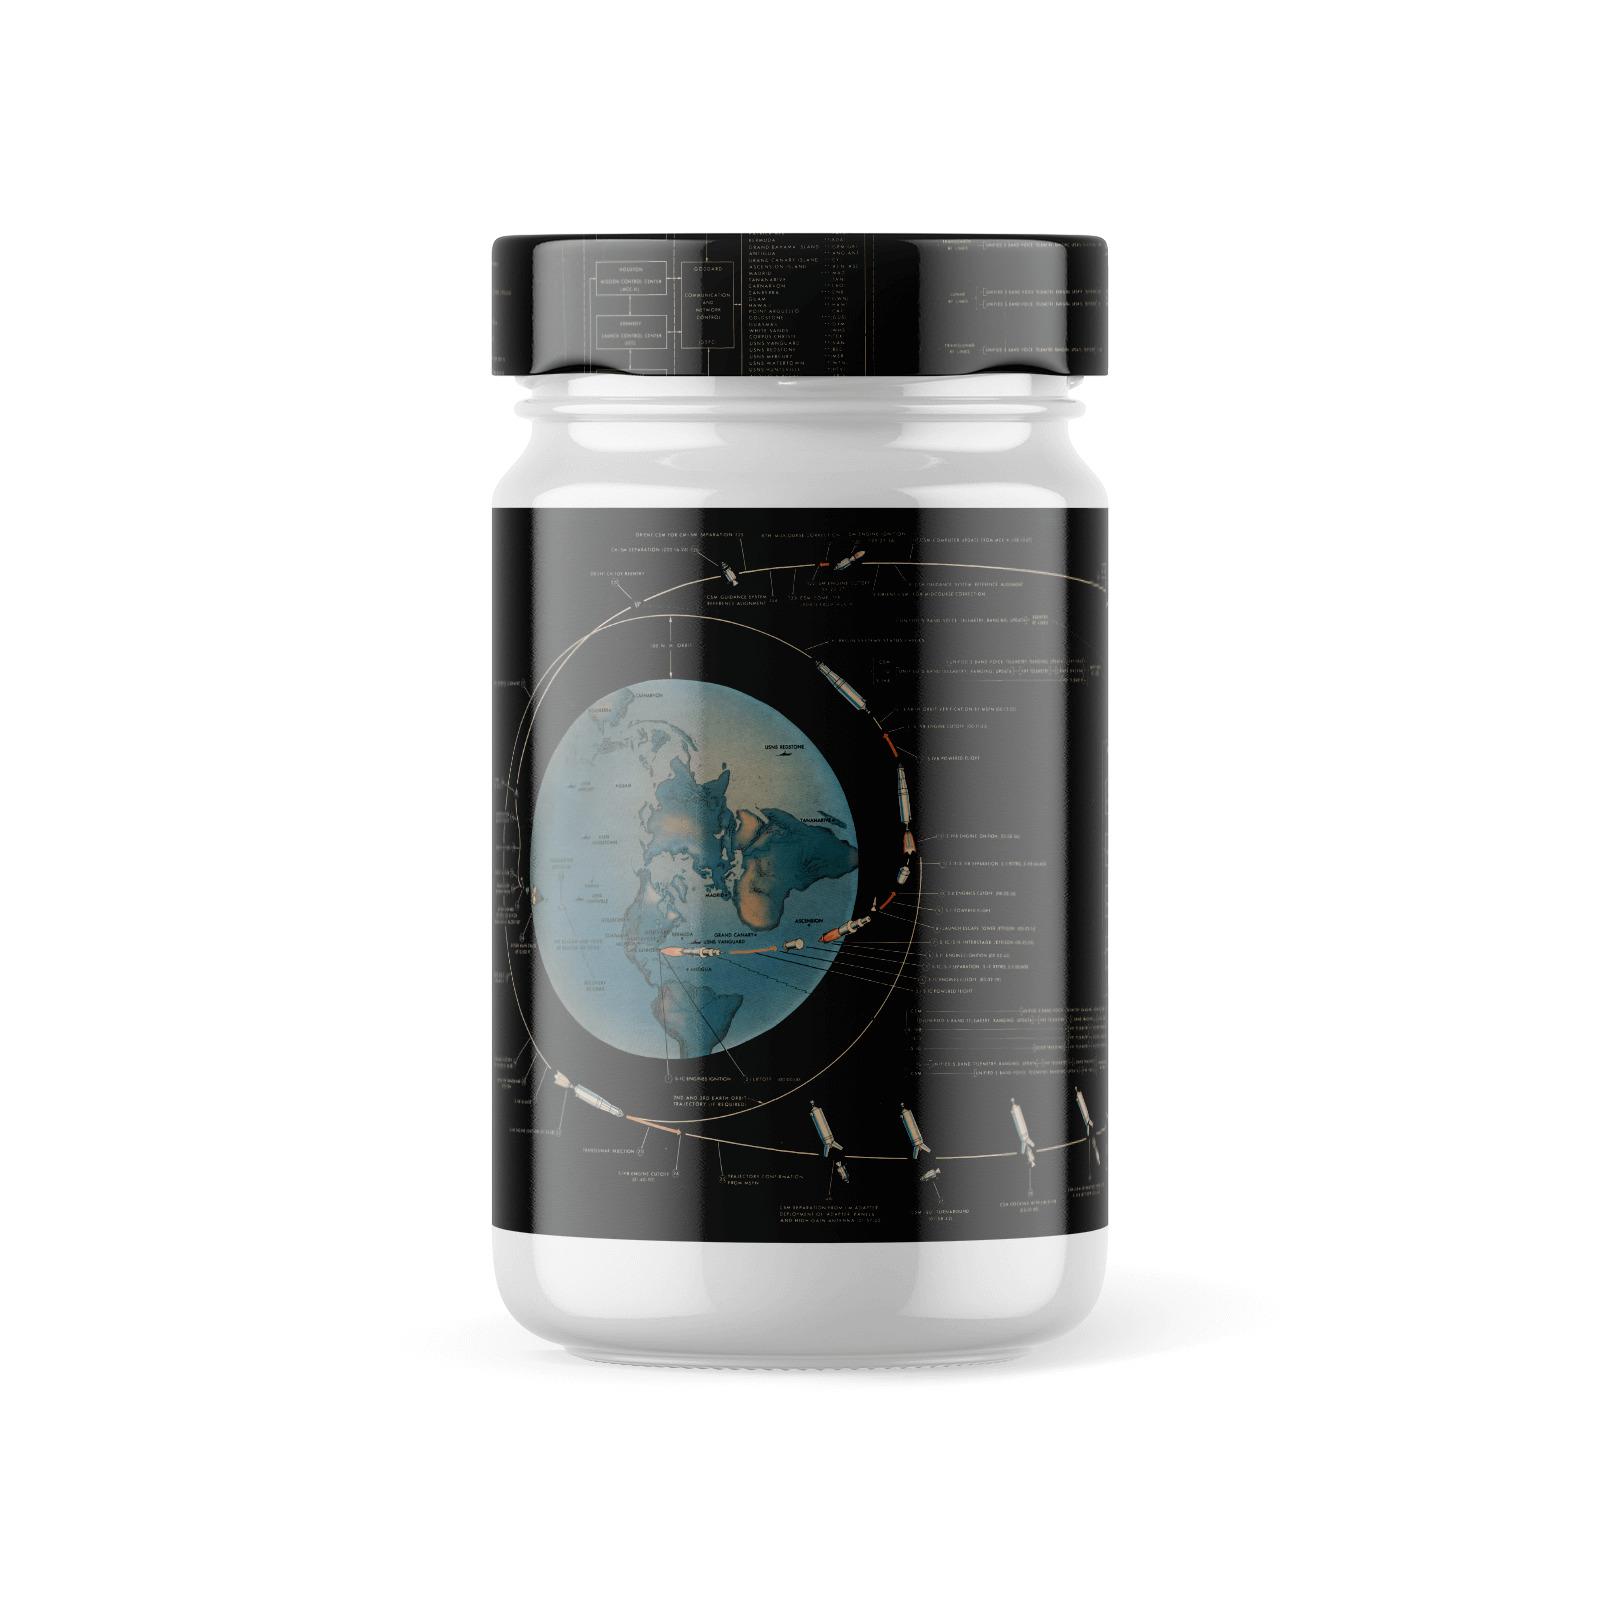 Free Glossy Jar with Lid Mockup